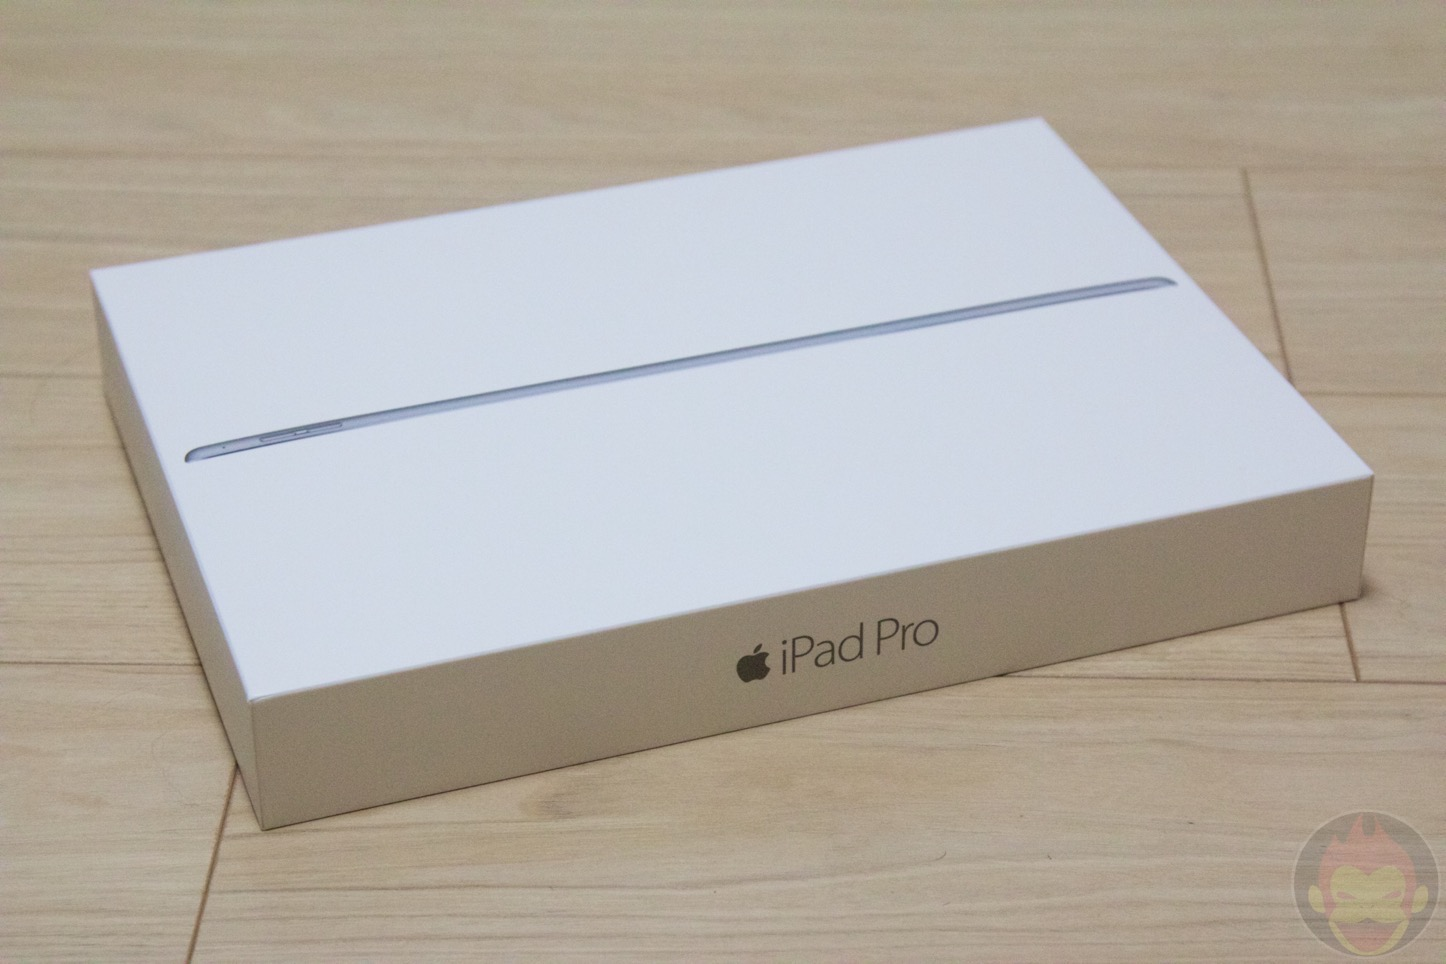 iPad-Pro-Unboxing-01.jpg